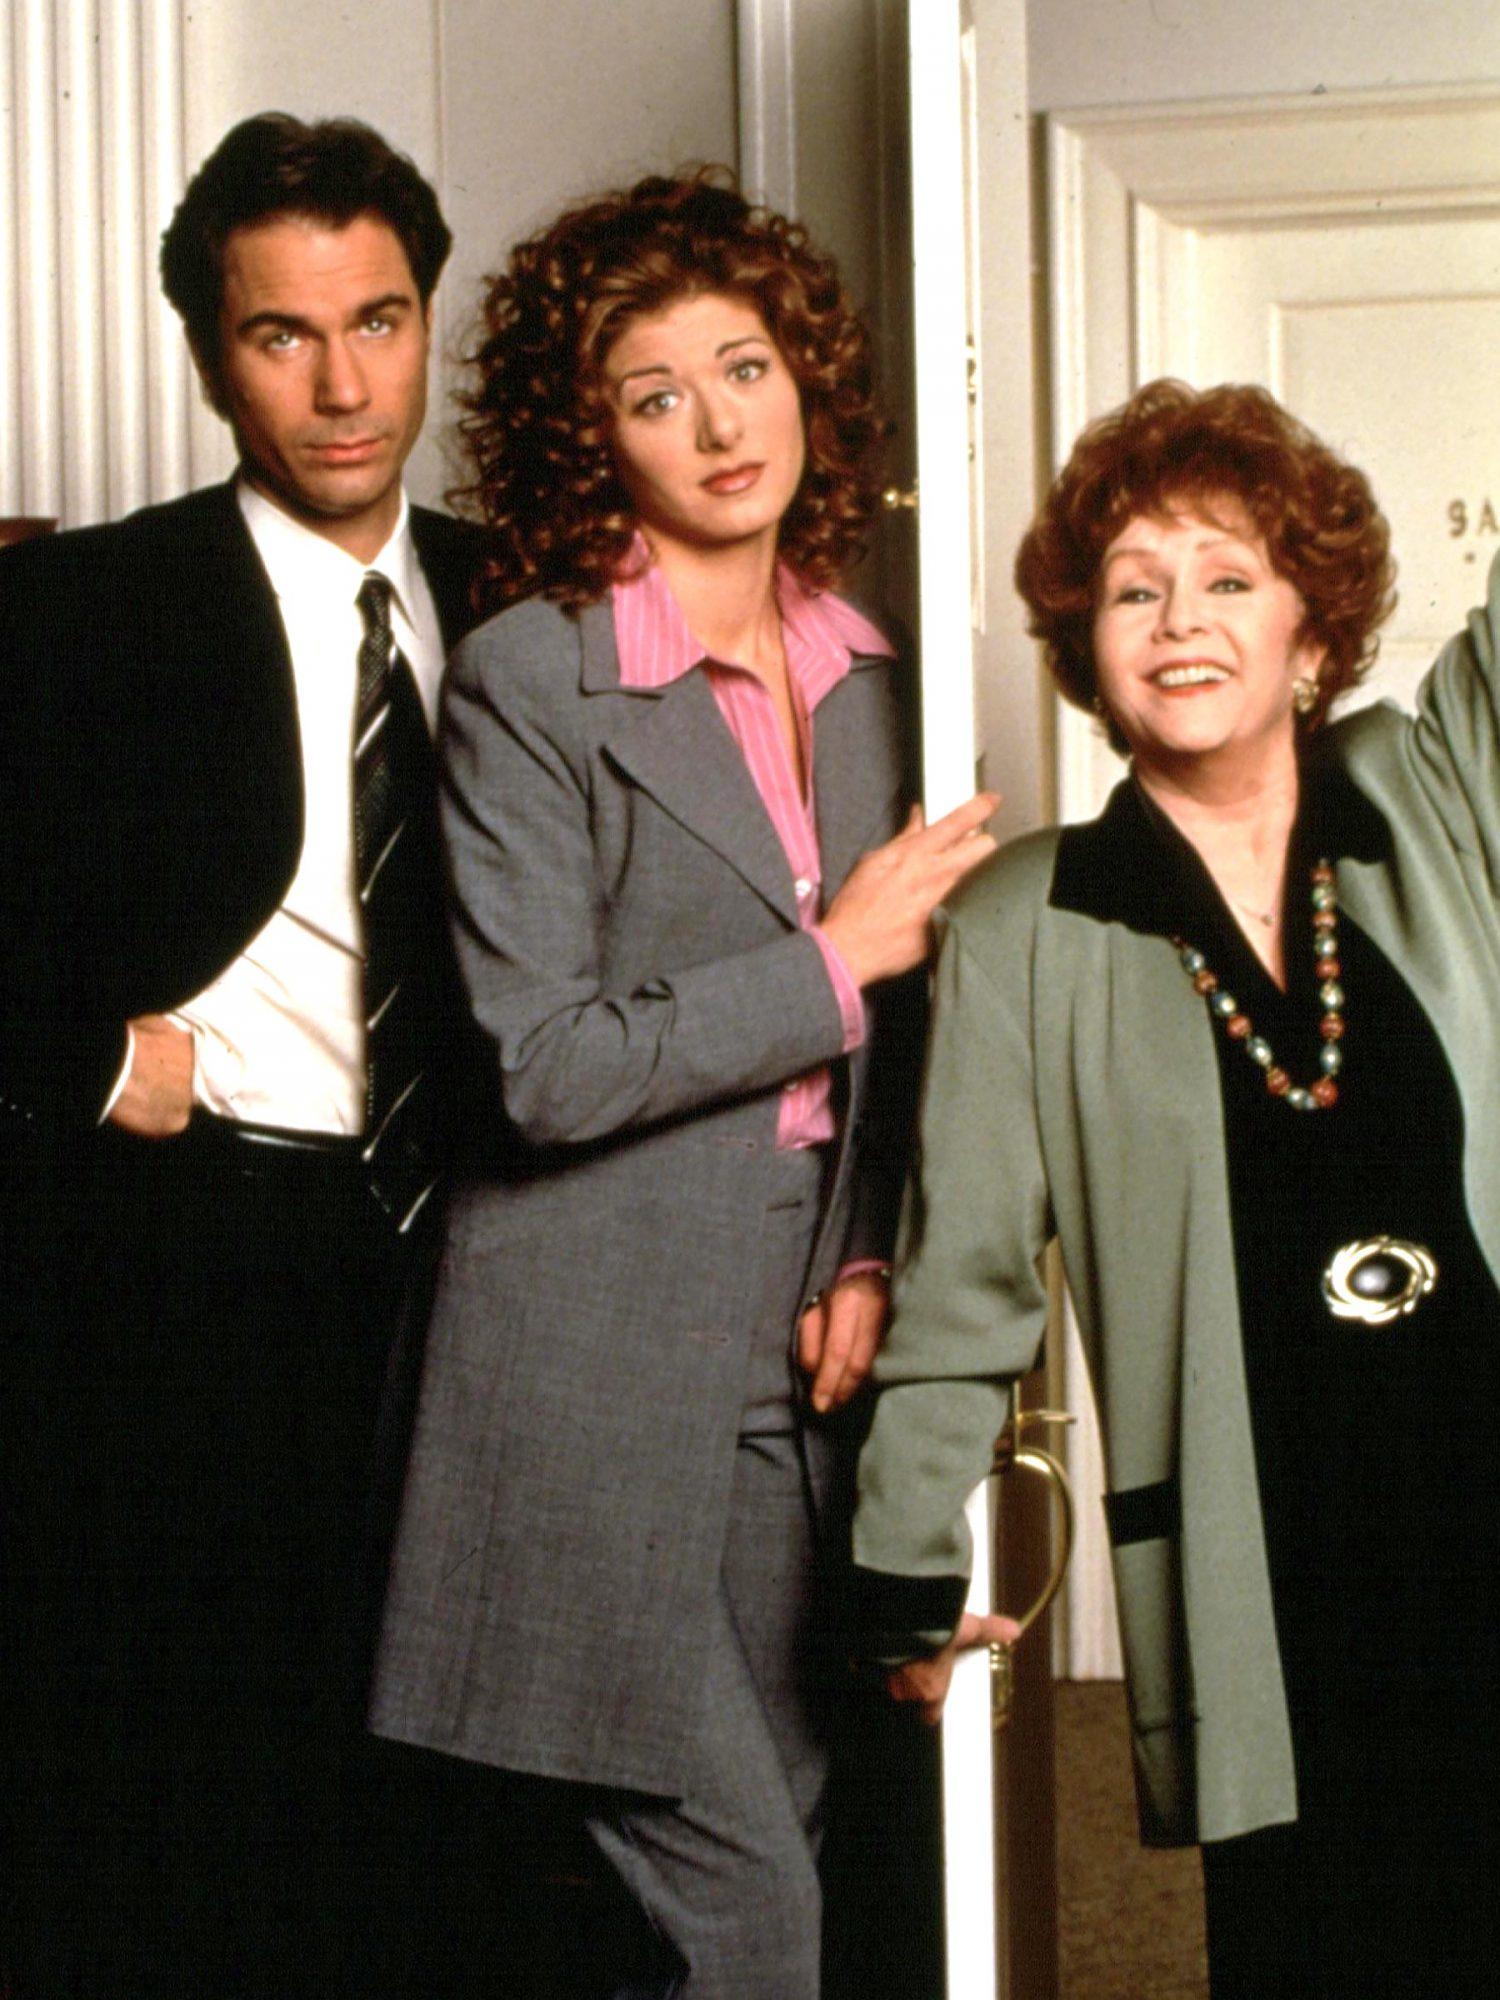 WILL & GRACE, Eric McCormack, Debra Messing, Debbie Reynolds, 1998-2006.